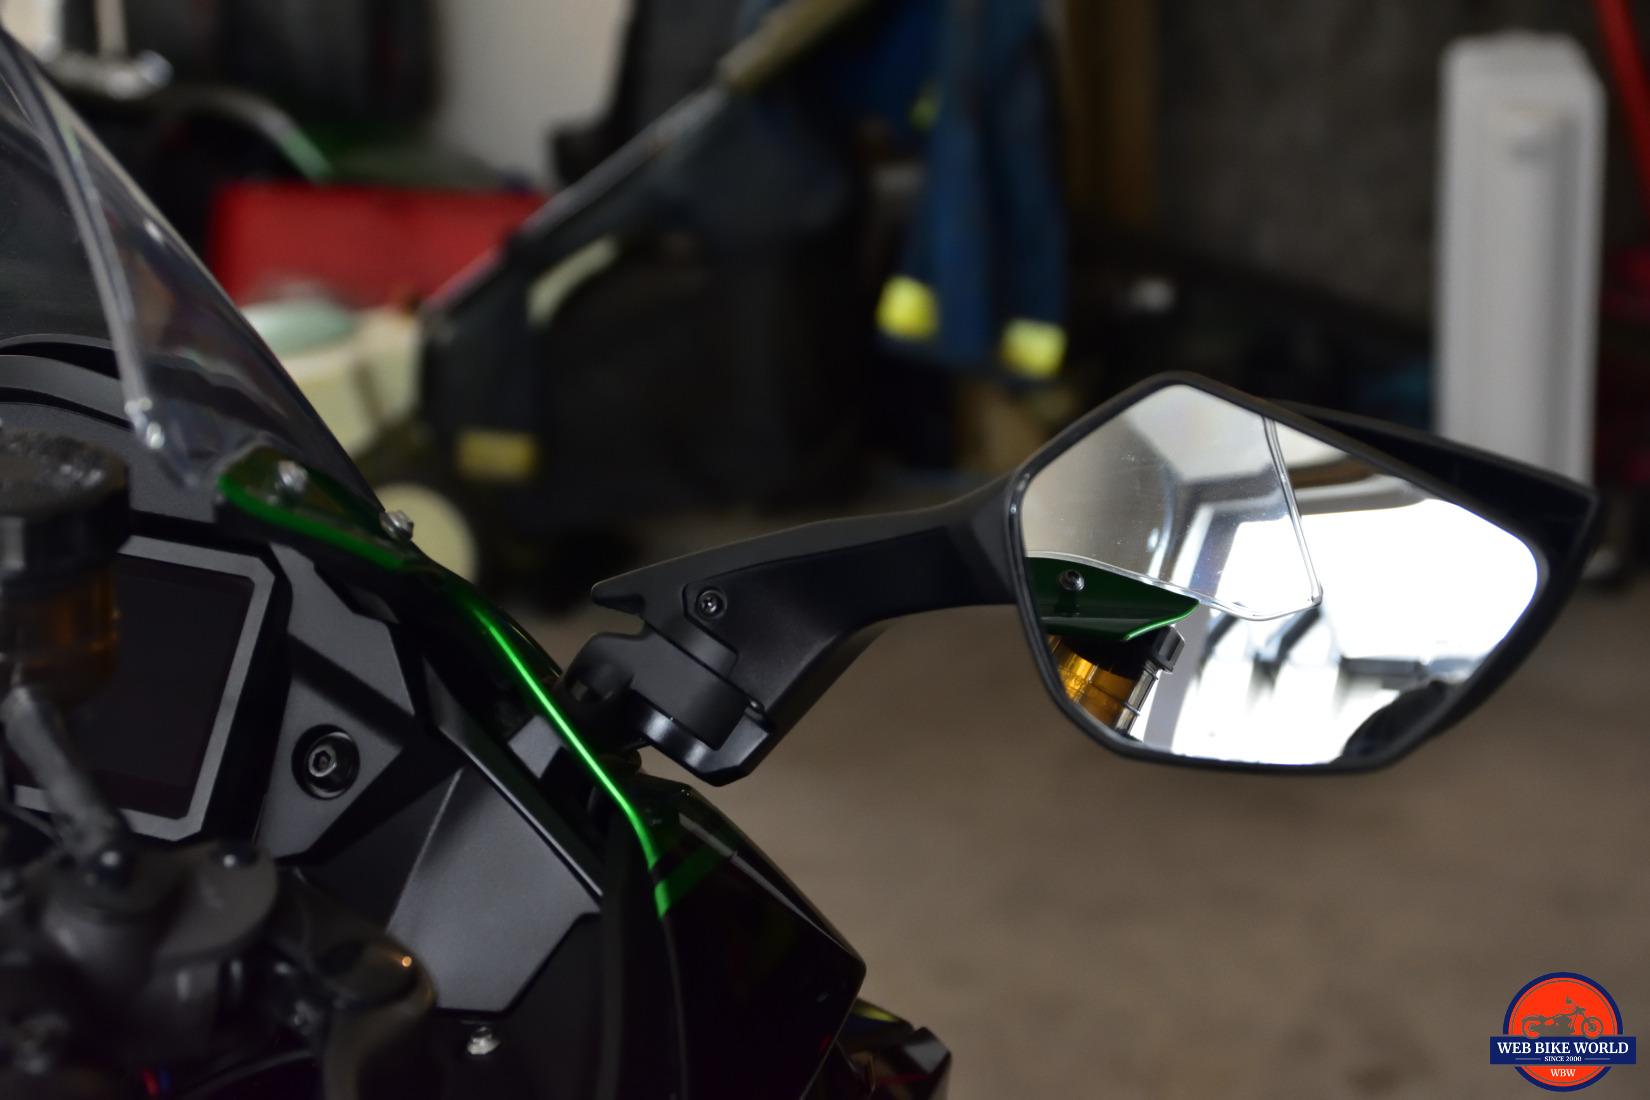 2018 Kawasaki Ninja H2SXSE mirror.